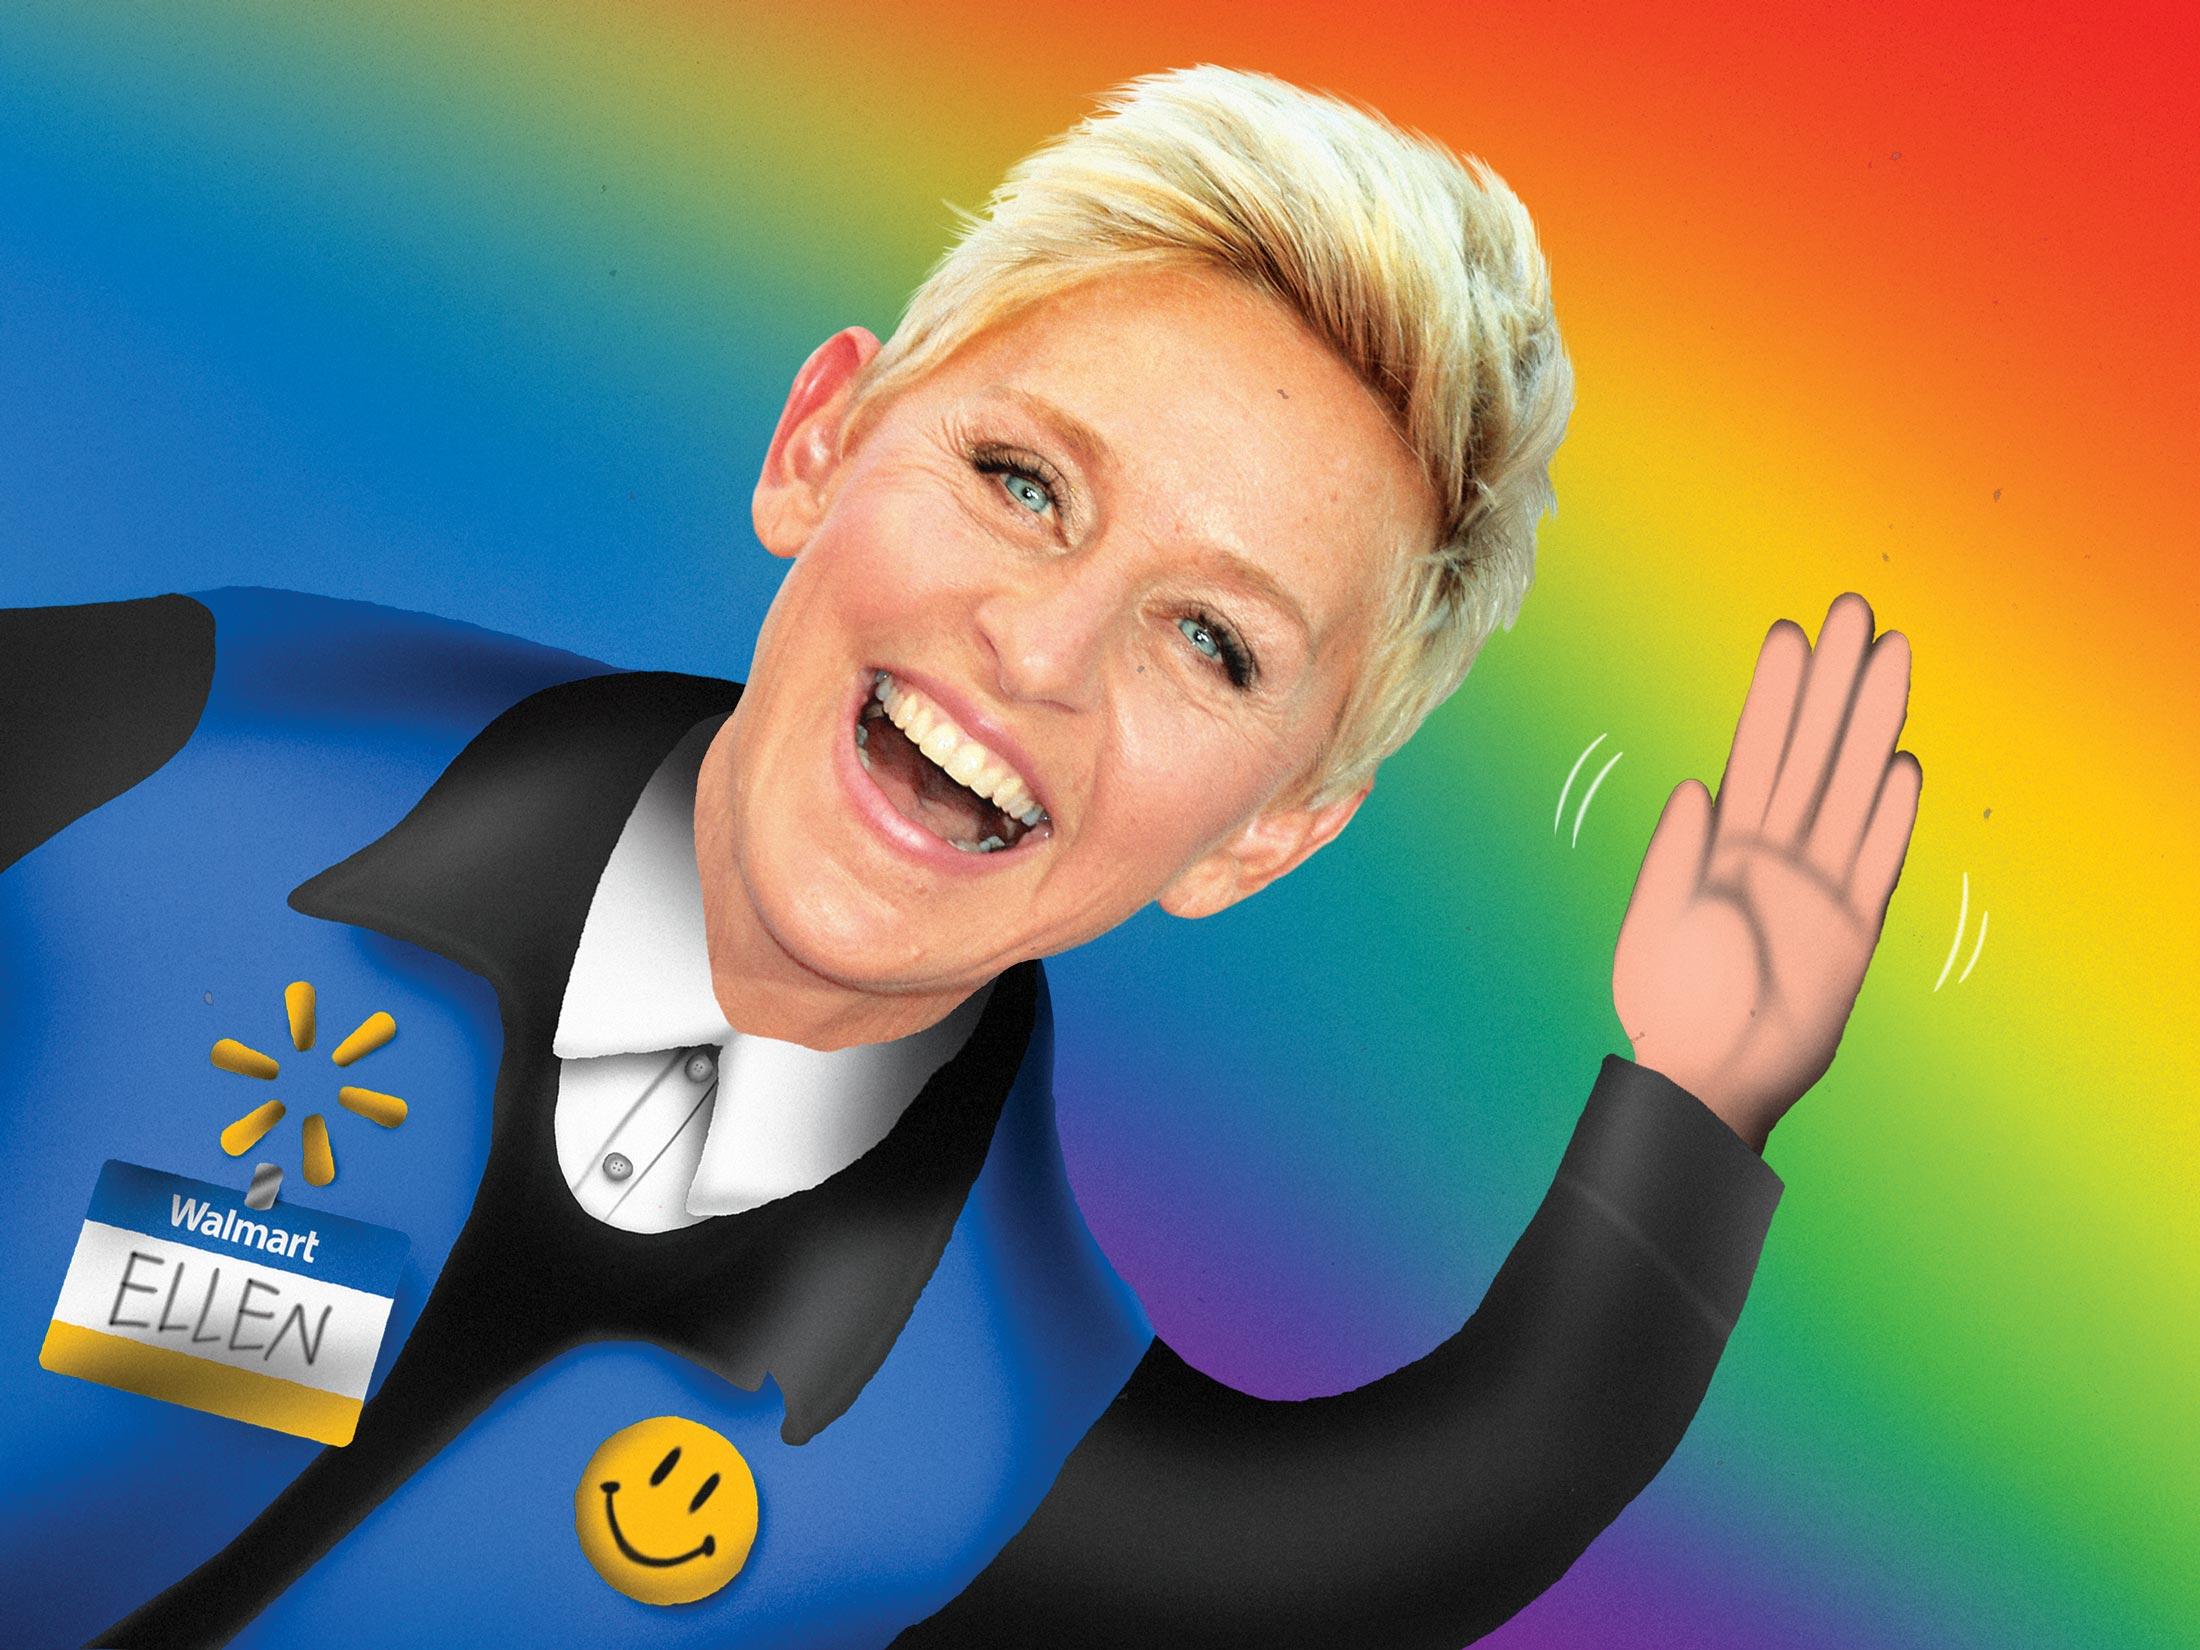 Walmart's Deal With Ellen DeGeneres Shows How Much America Has Changed